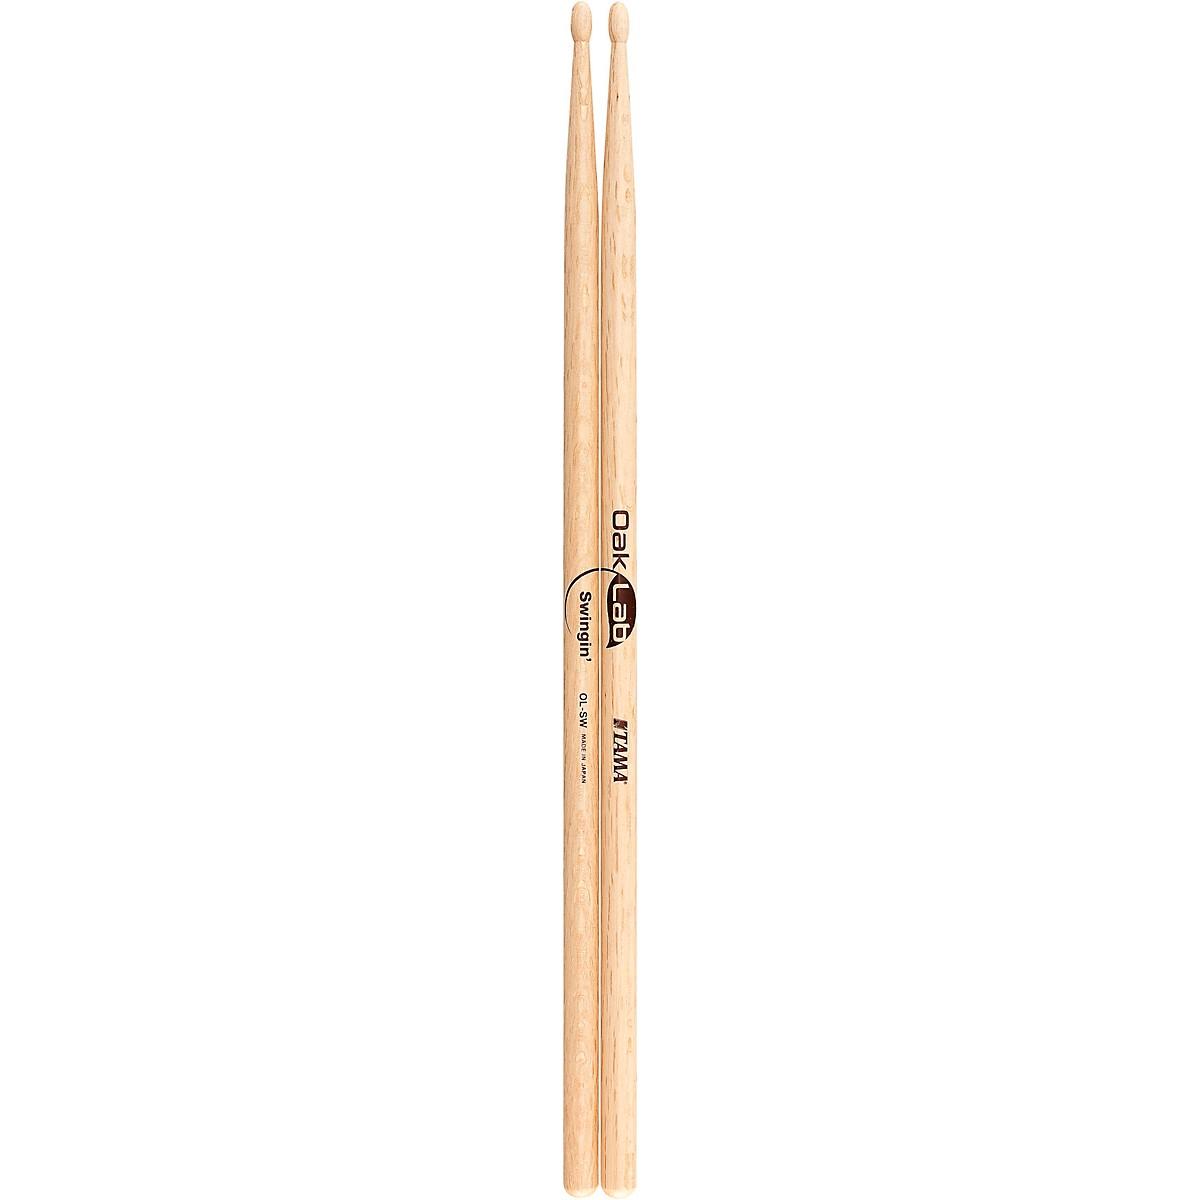 TAMA Oak Lab Series Swingin' Drum Sticks